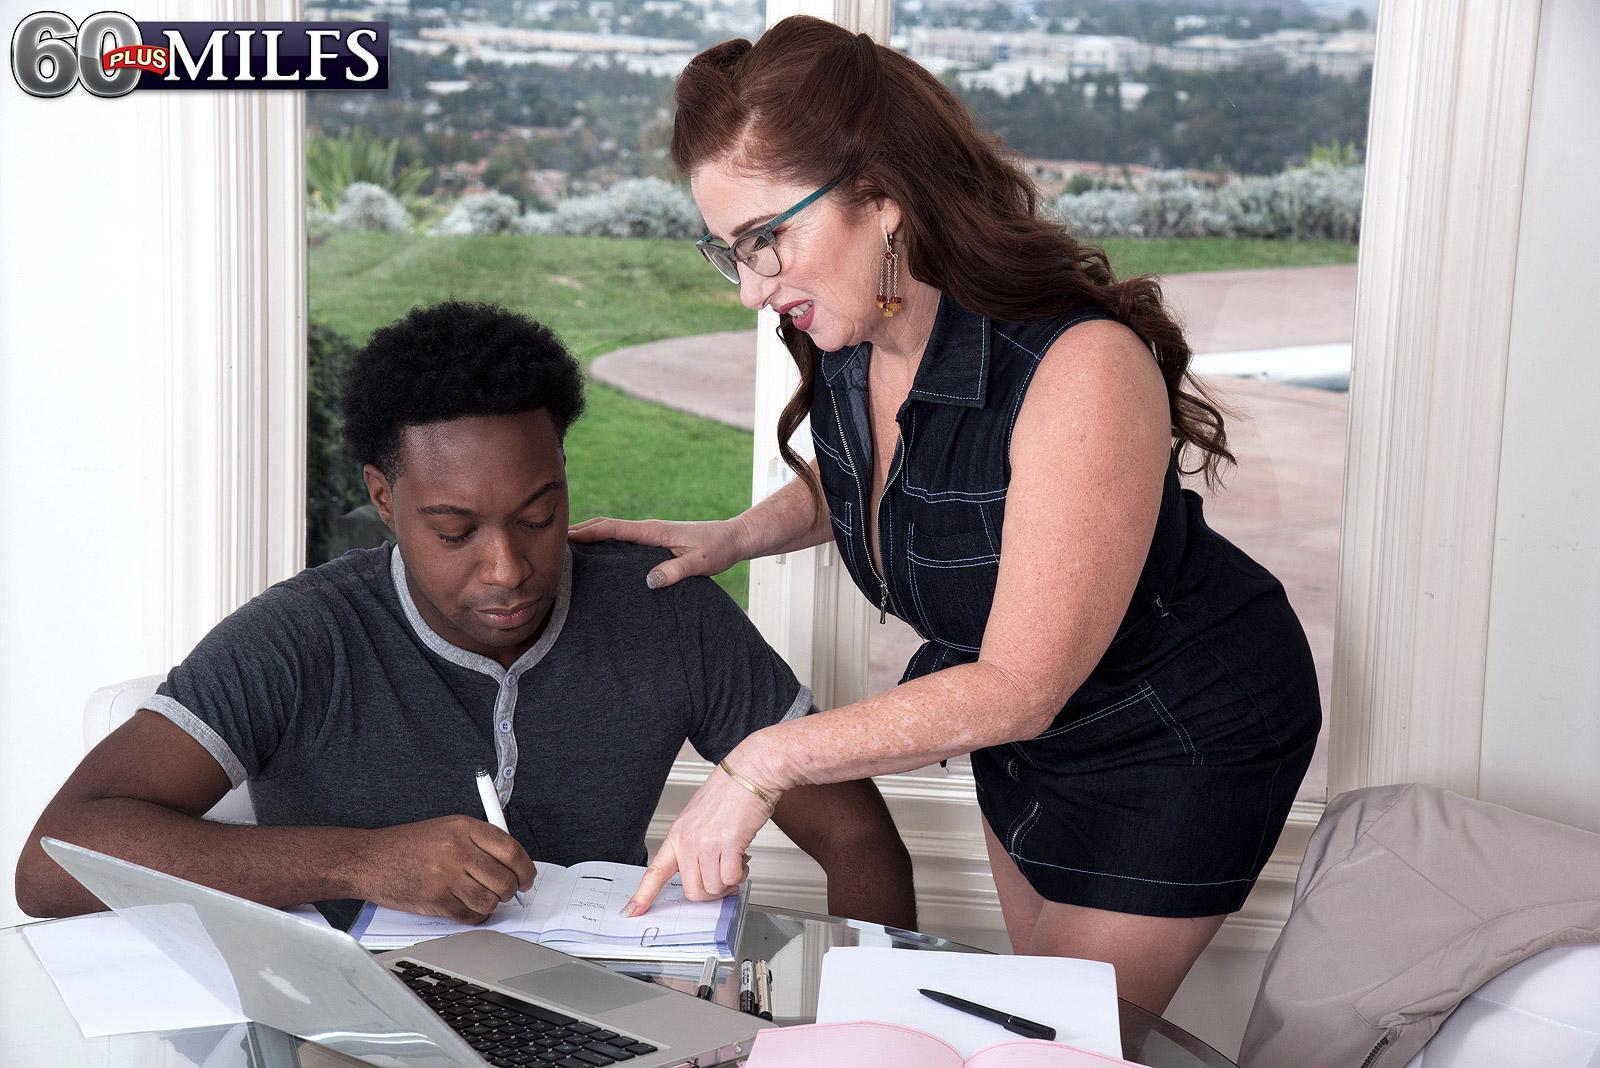 Over sixty broad Maria Fawndeli seduces a junior ebony man while tutoring him